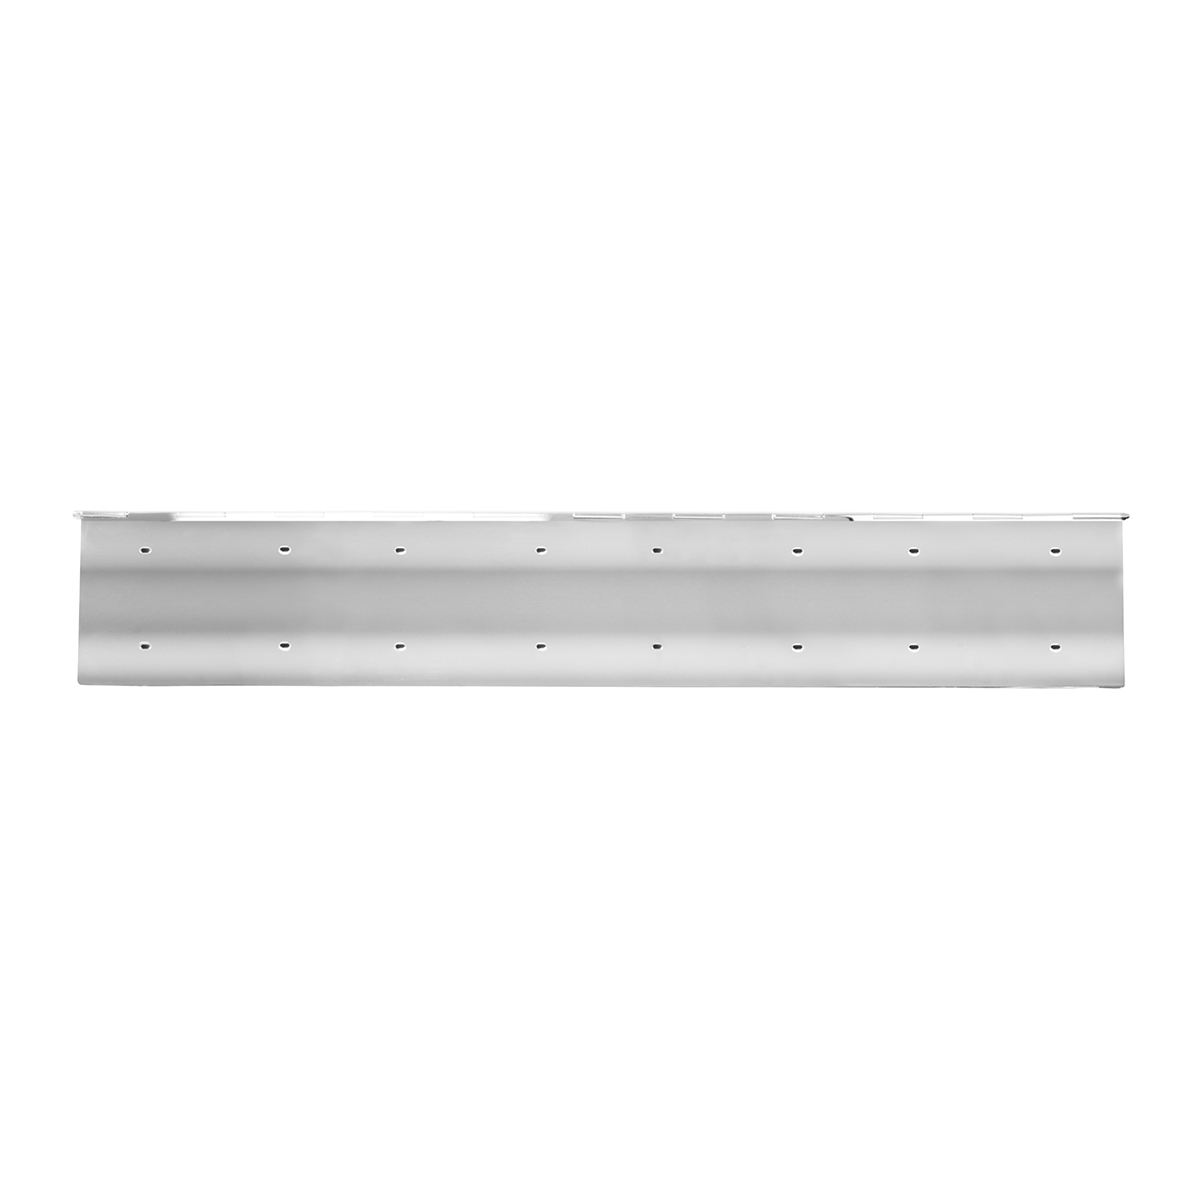 Chrome Plated Steel License Plate Holder - 4 License Plate Frame